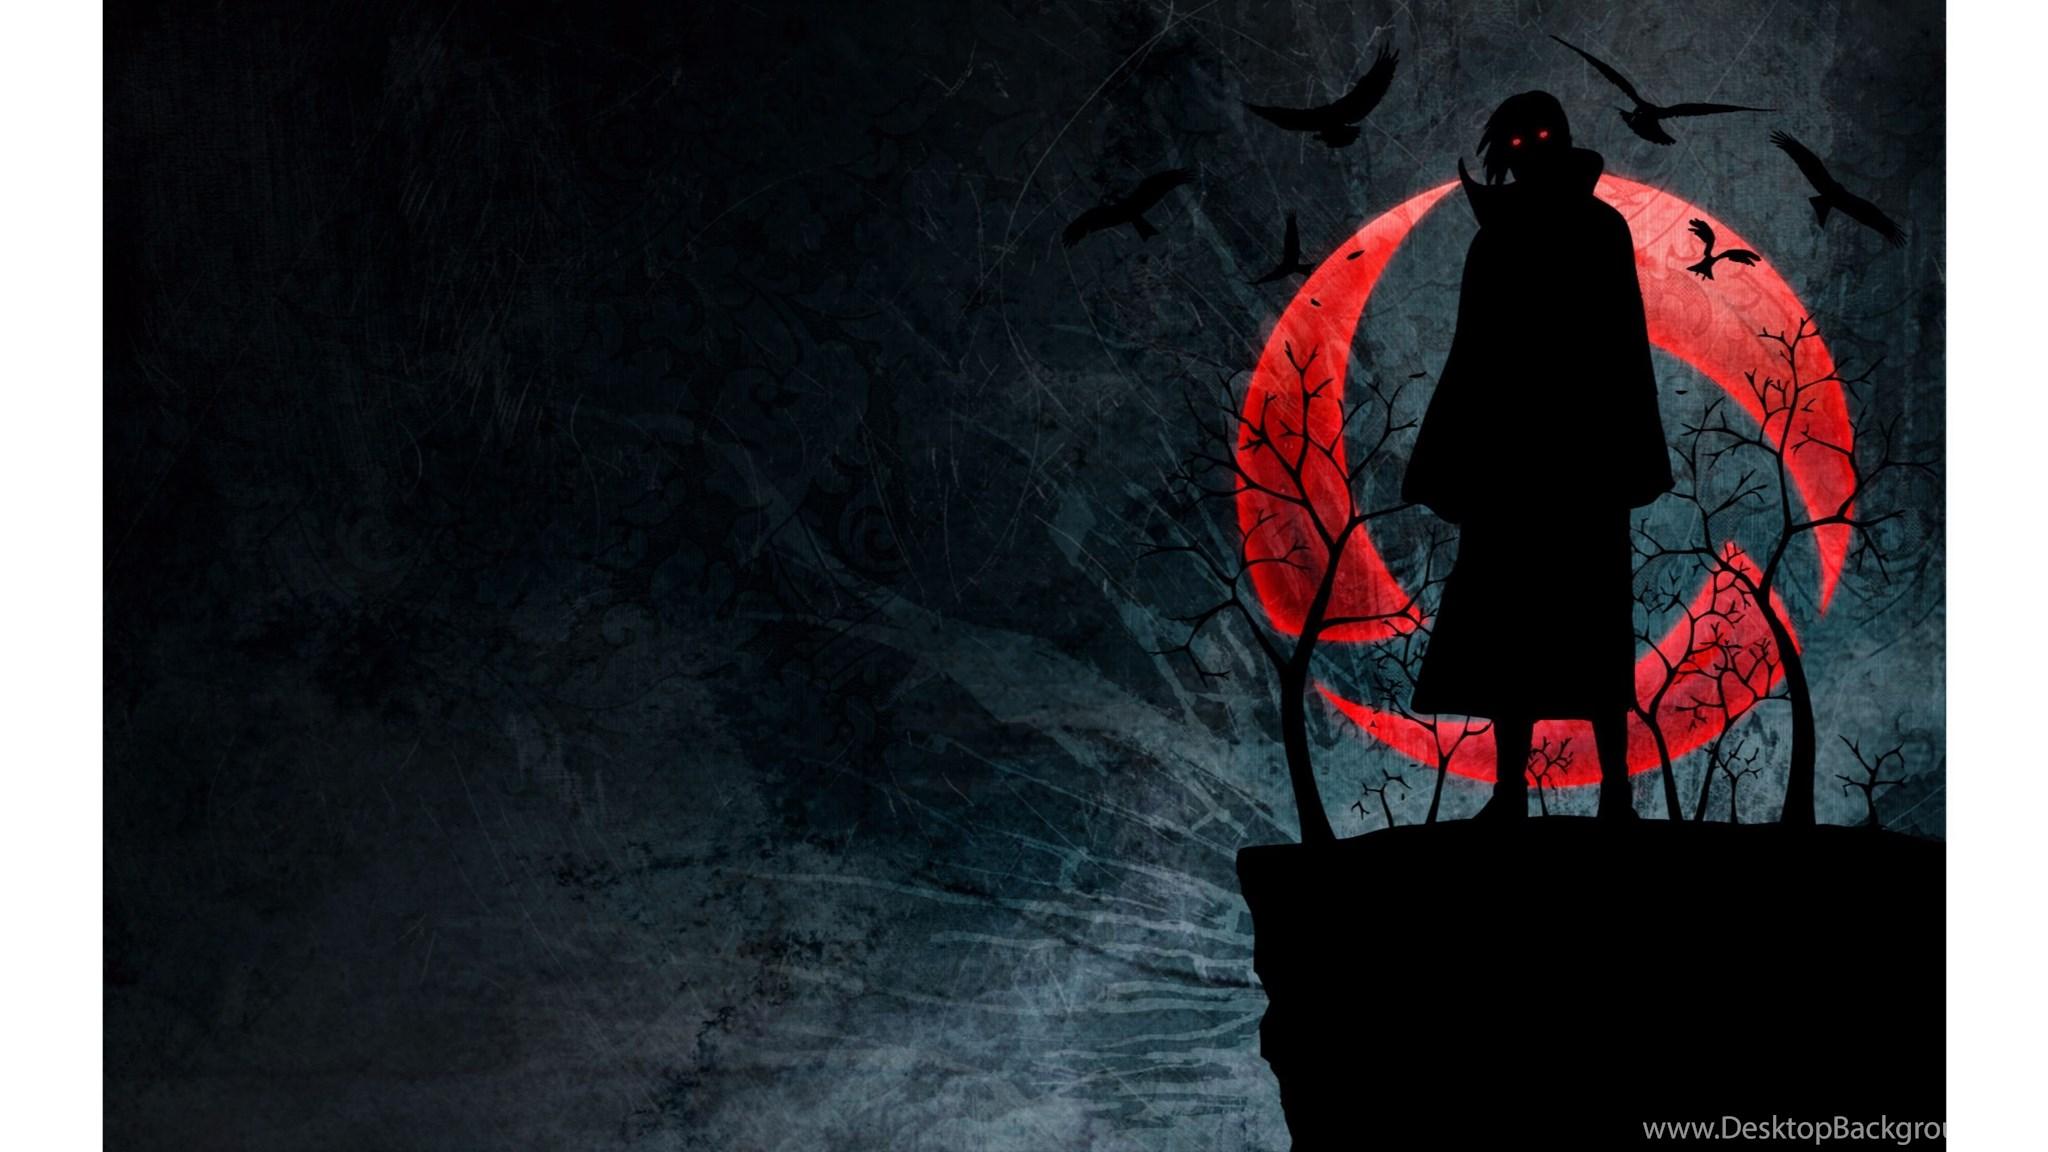 Scary Night 4k Anime Wallpapers Desktop Background